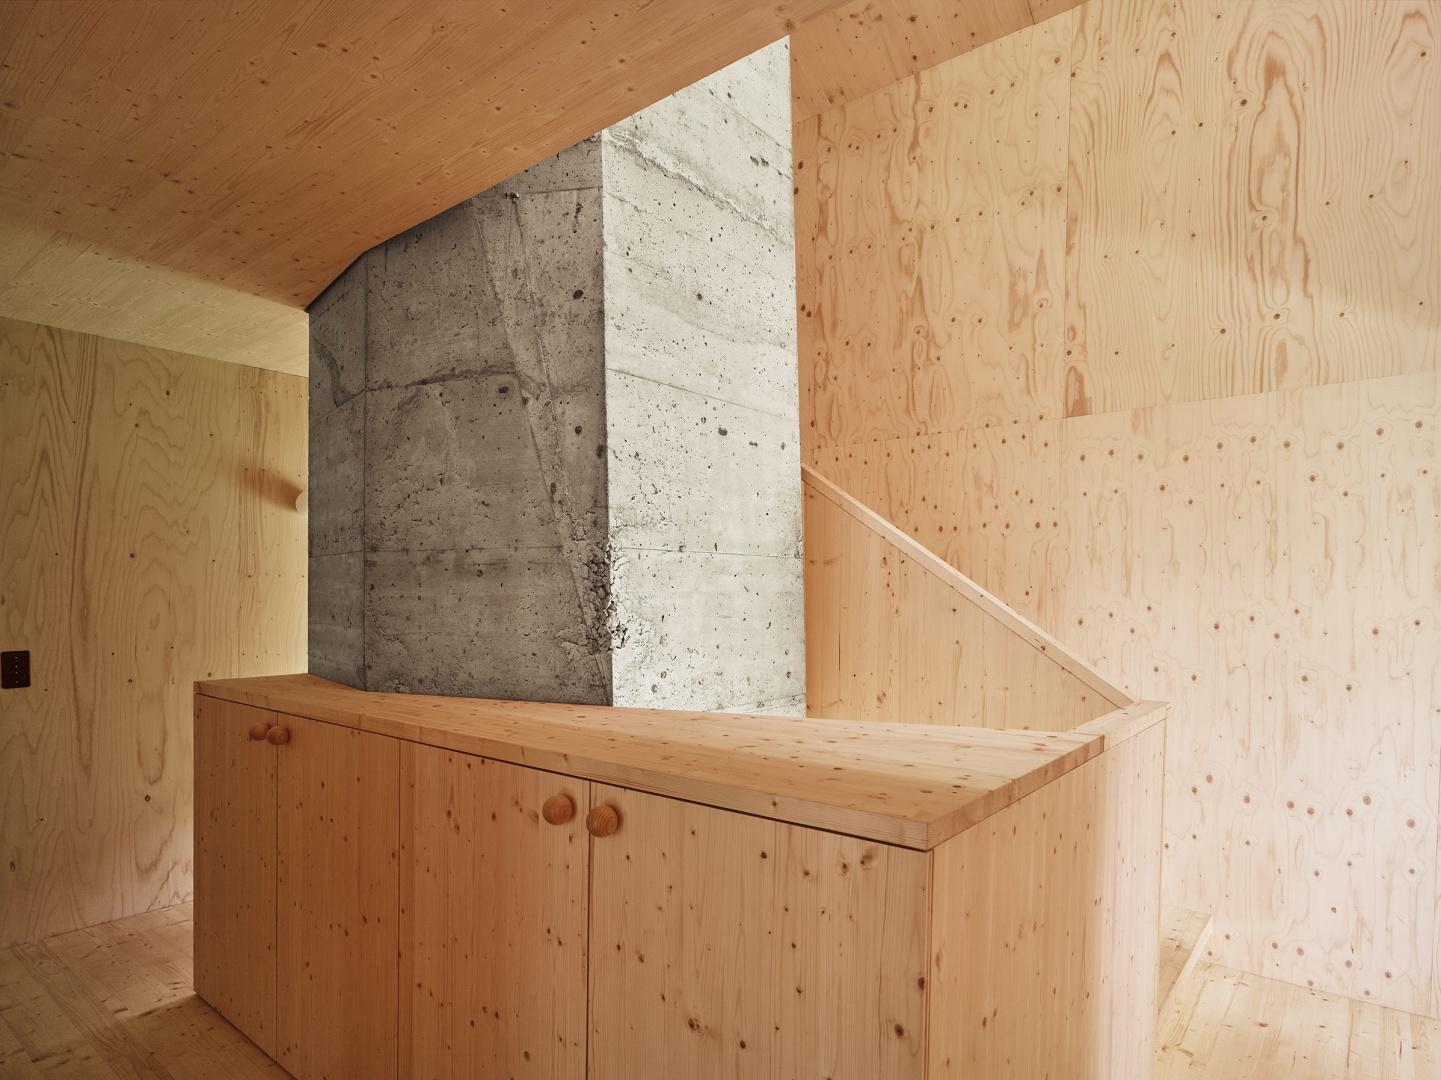 Treppenkern aus Beton  © Andreas Fuhrimann